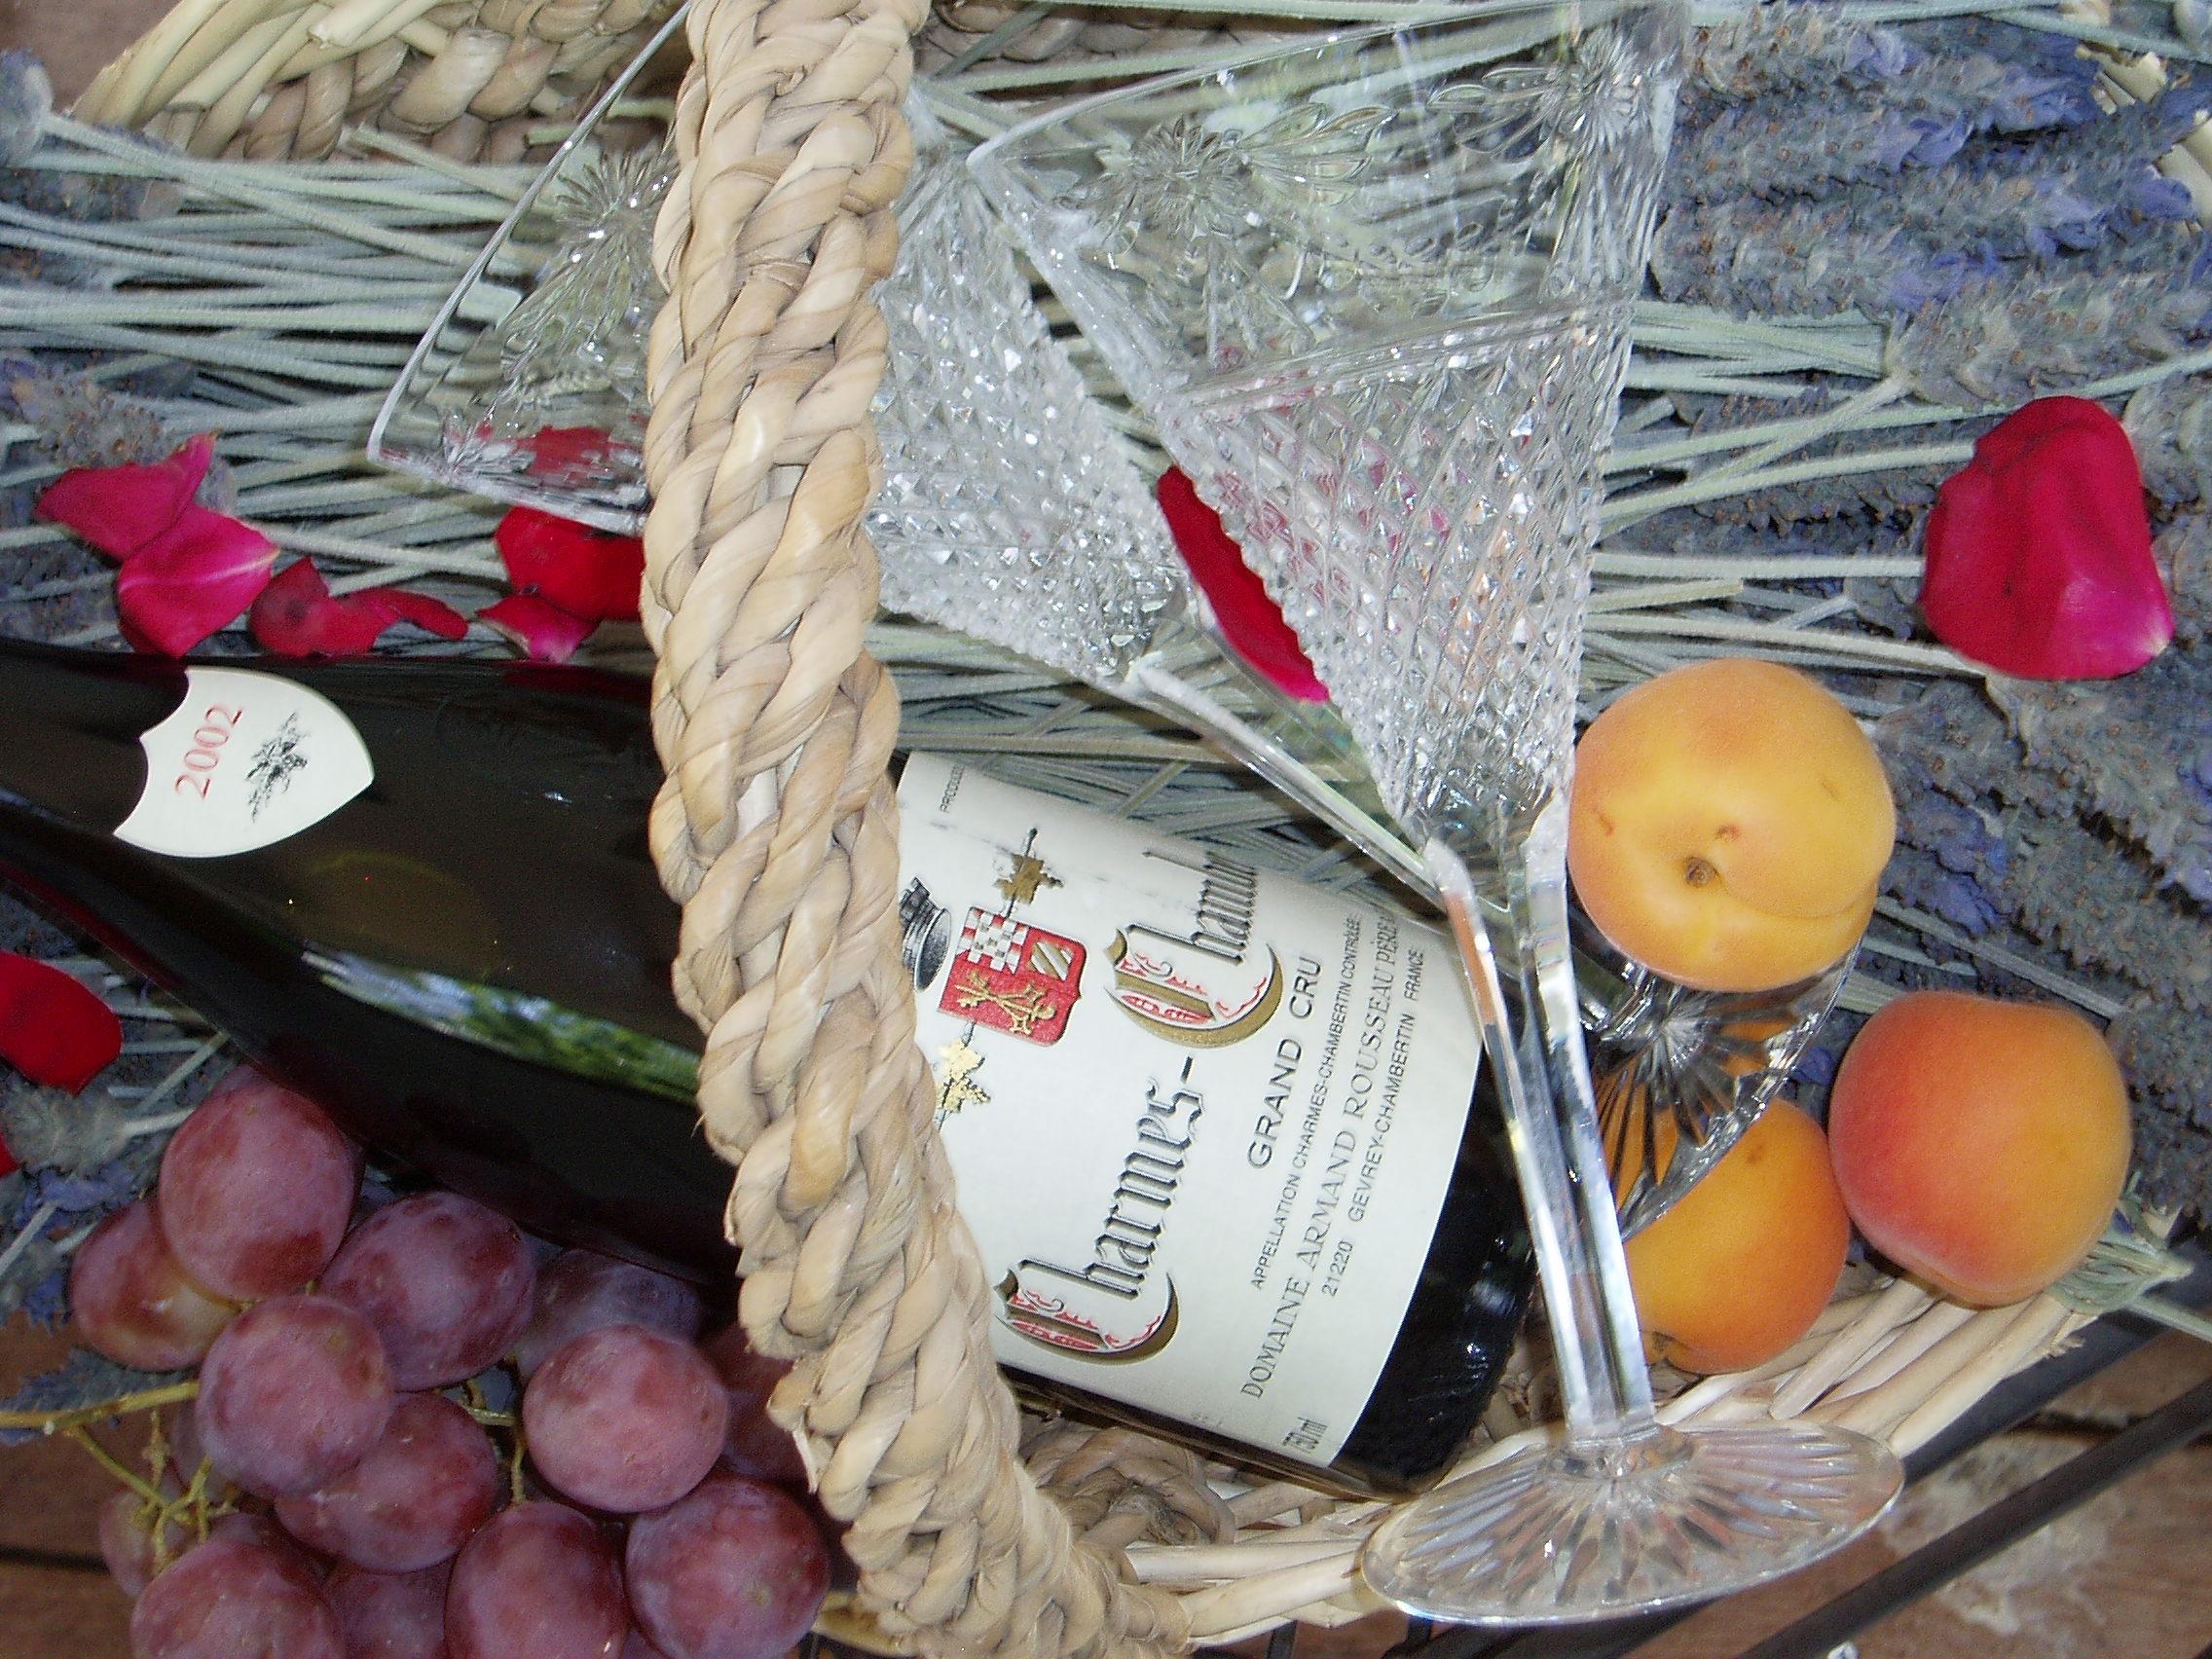 Offering premium international fine wines.